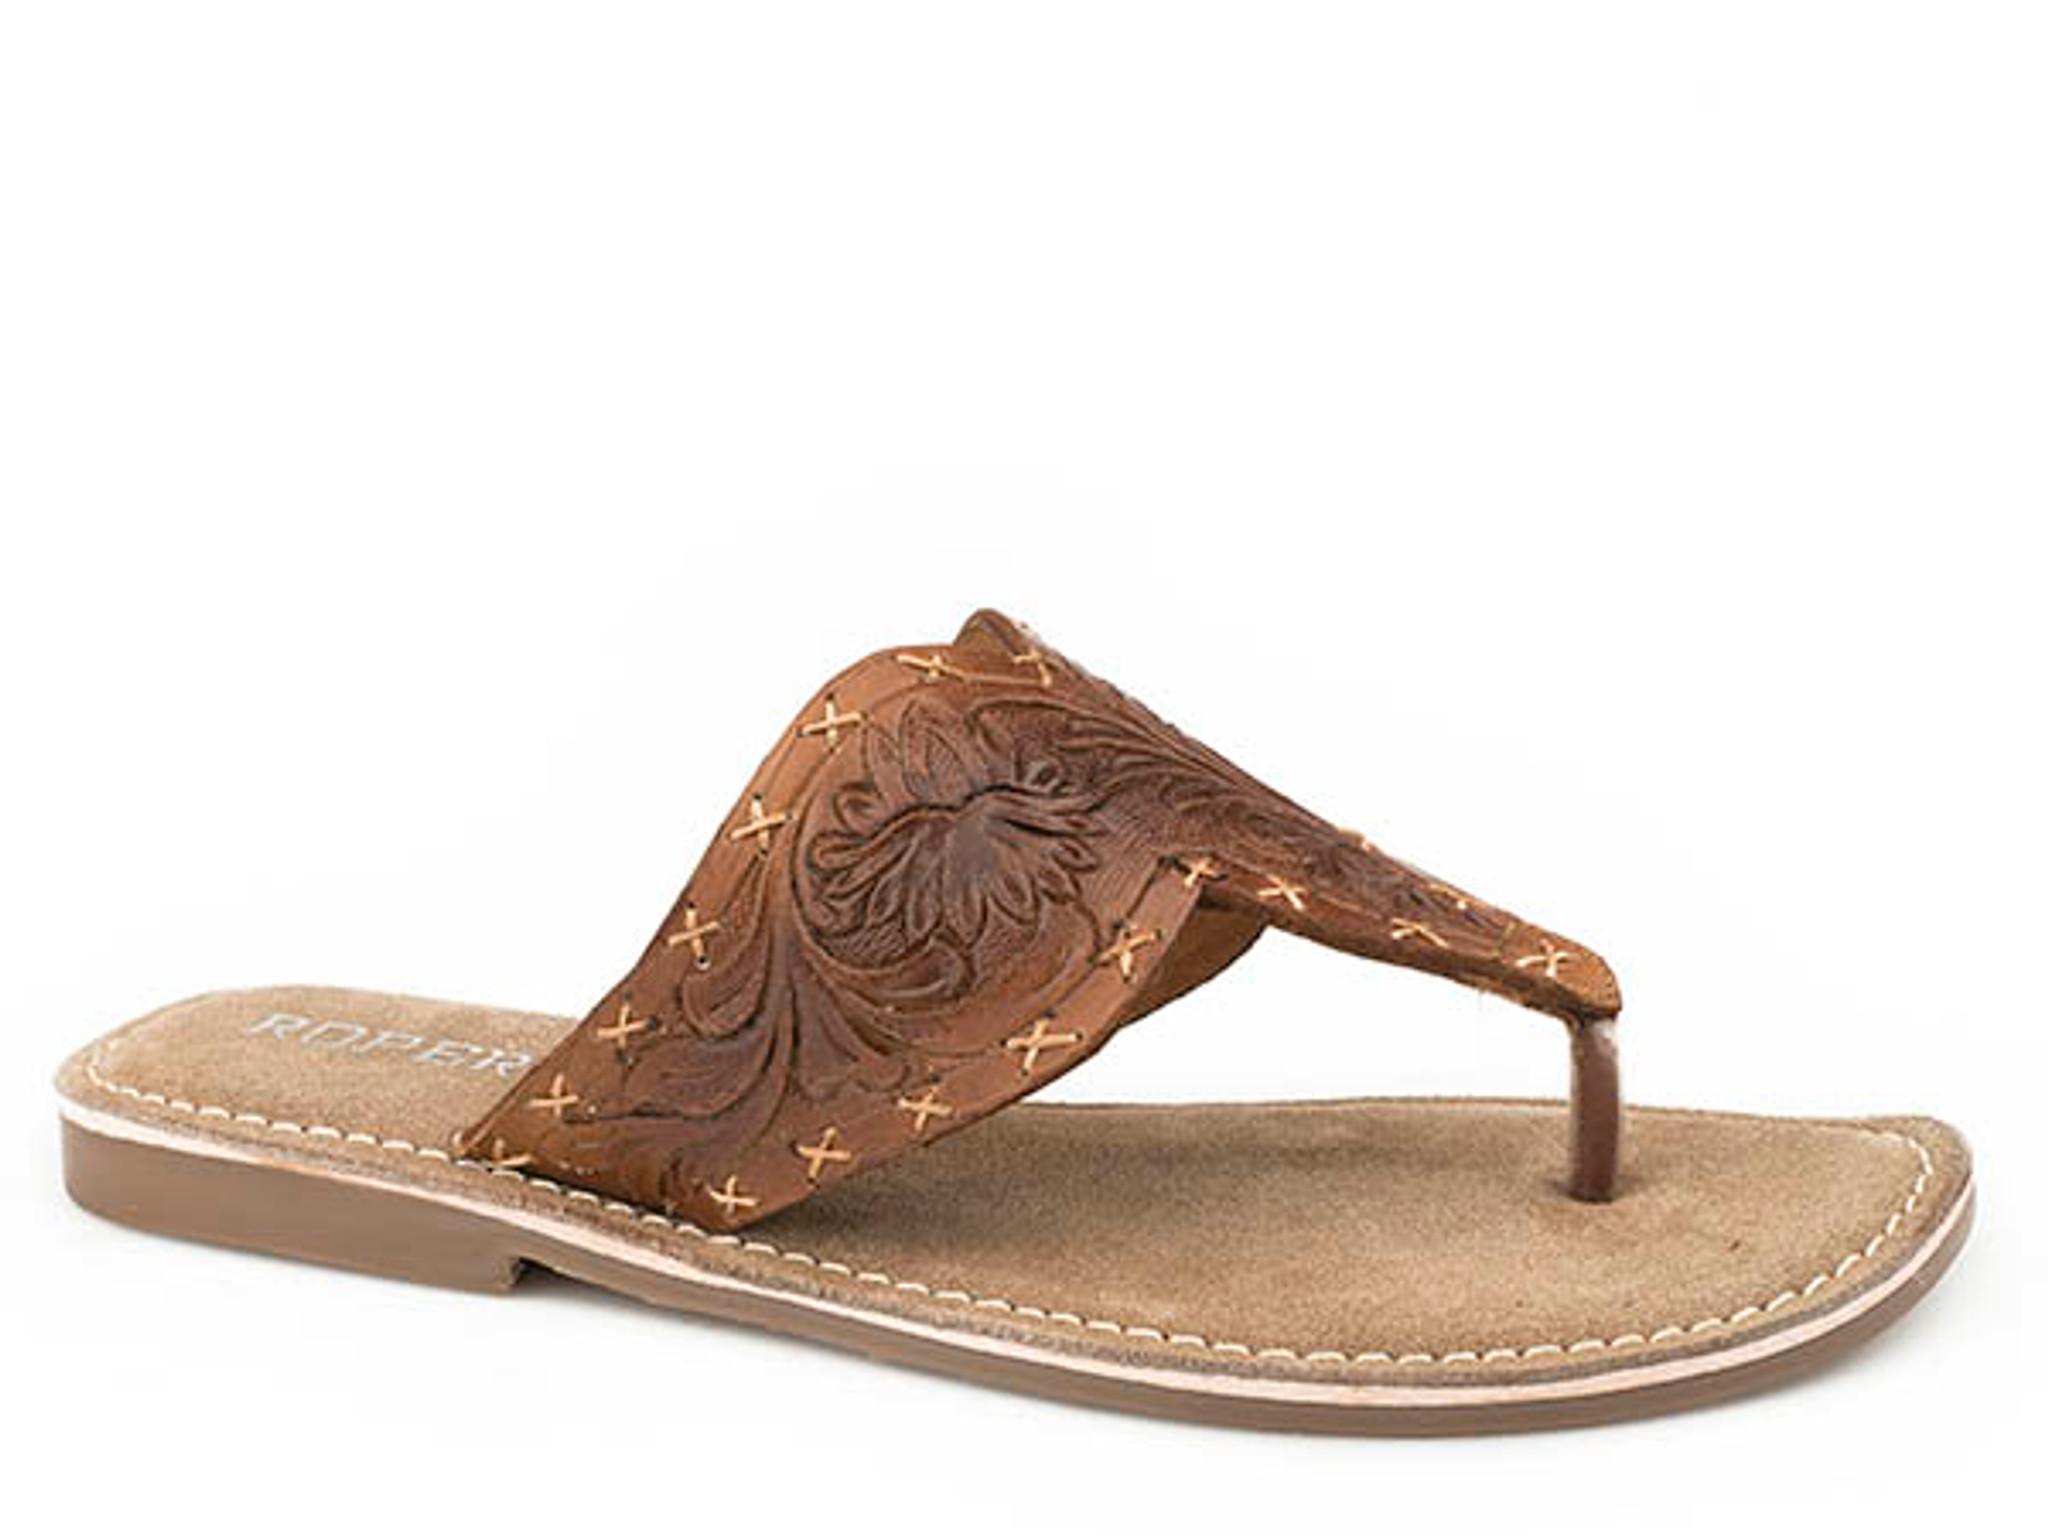 Women's Roper Flip Flops, Juliet, Tan